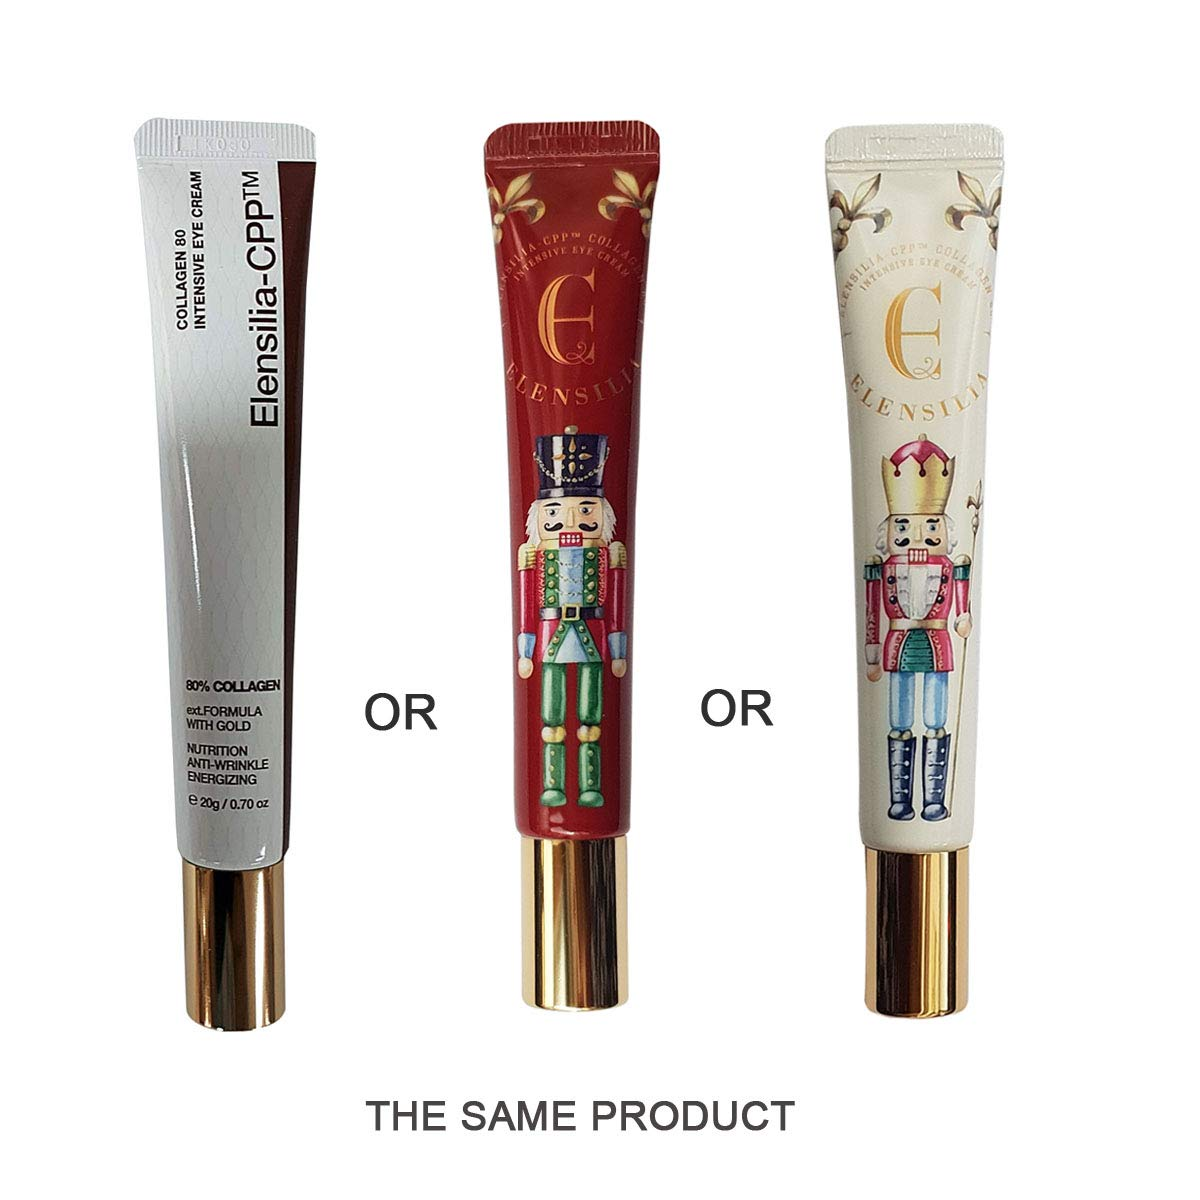 Top 5 Best Cheap Korean Eye Creams and Korean Moisturizer in 2021